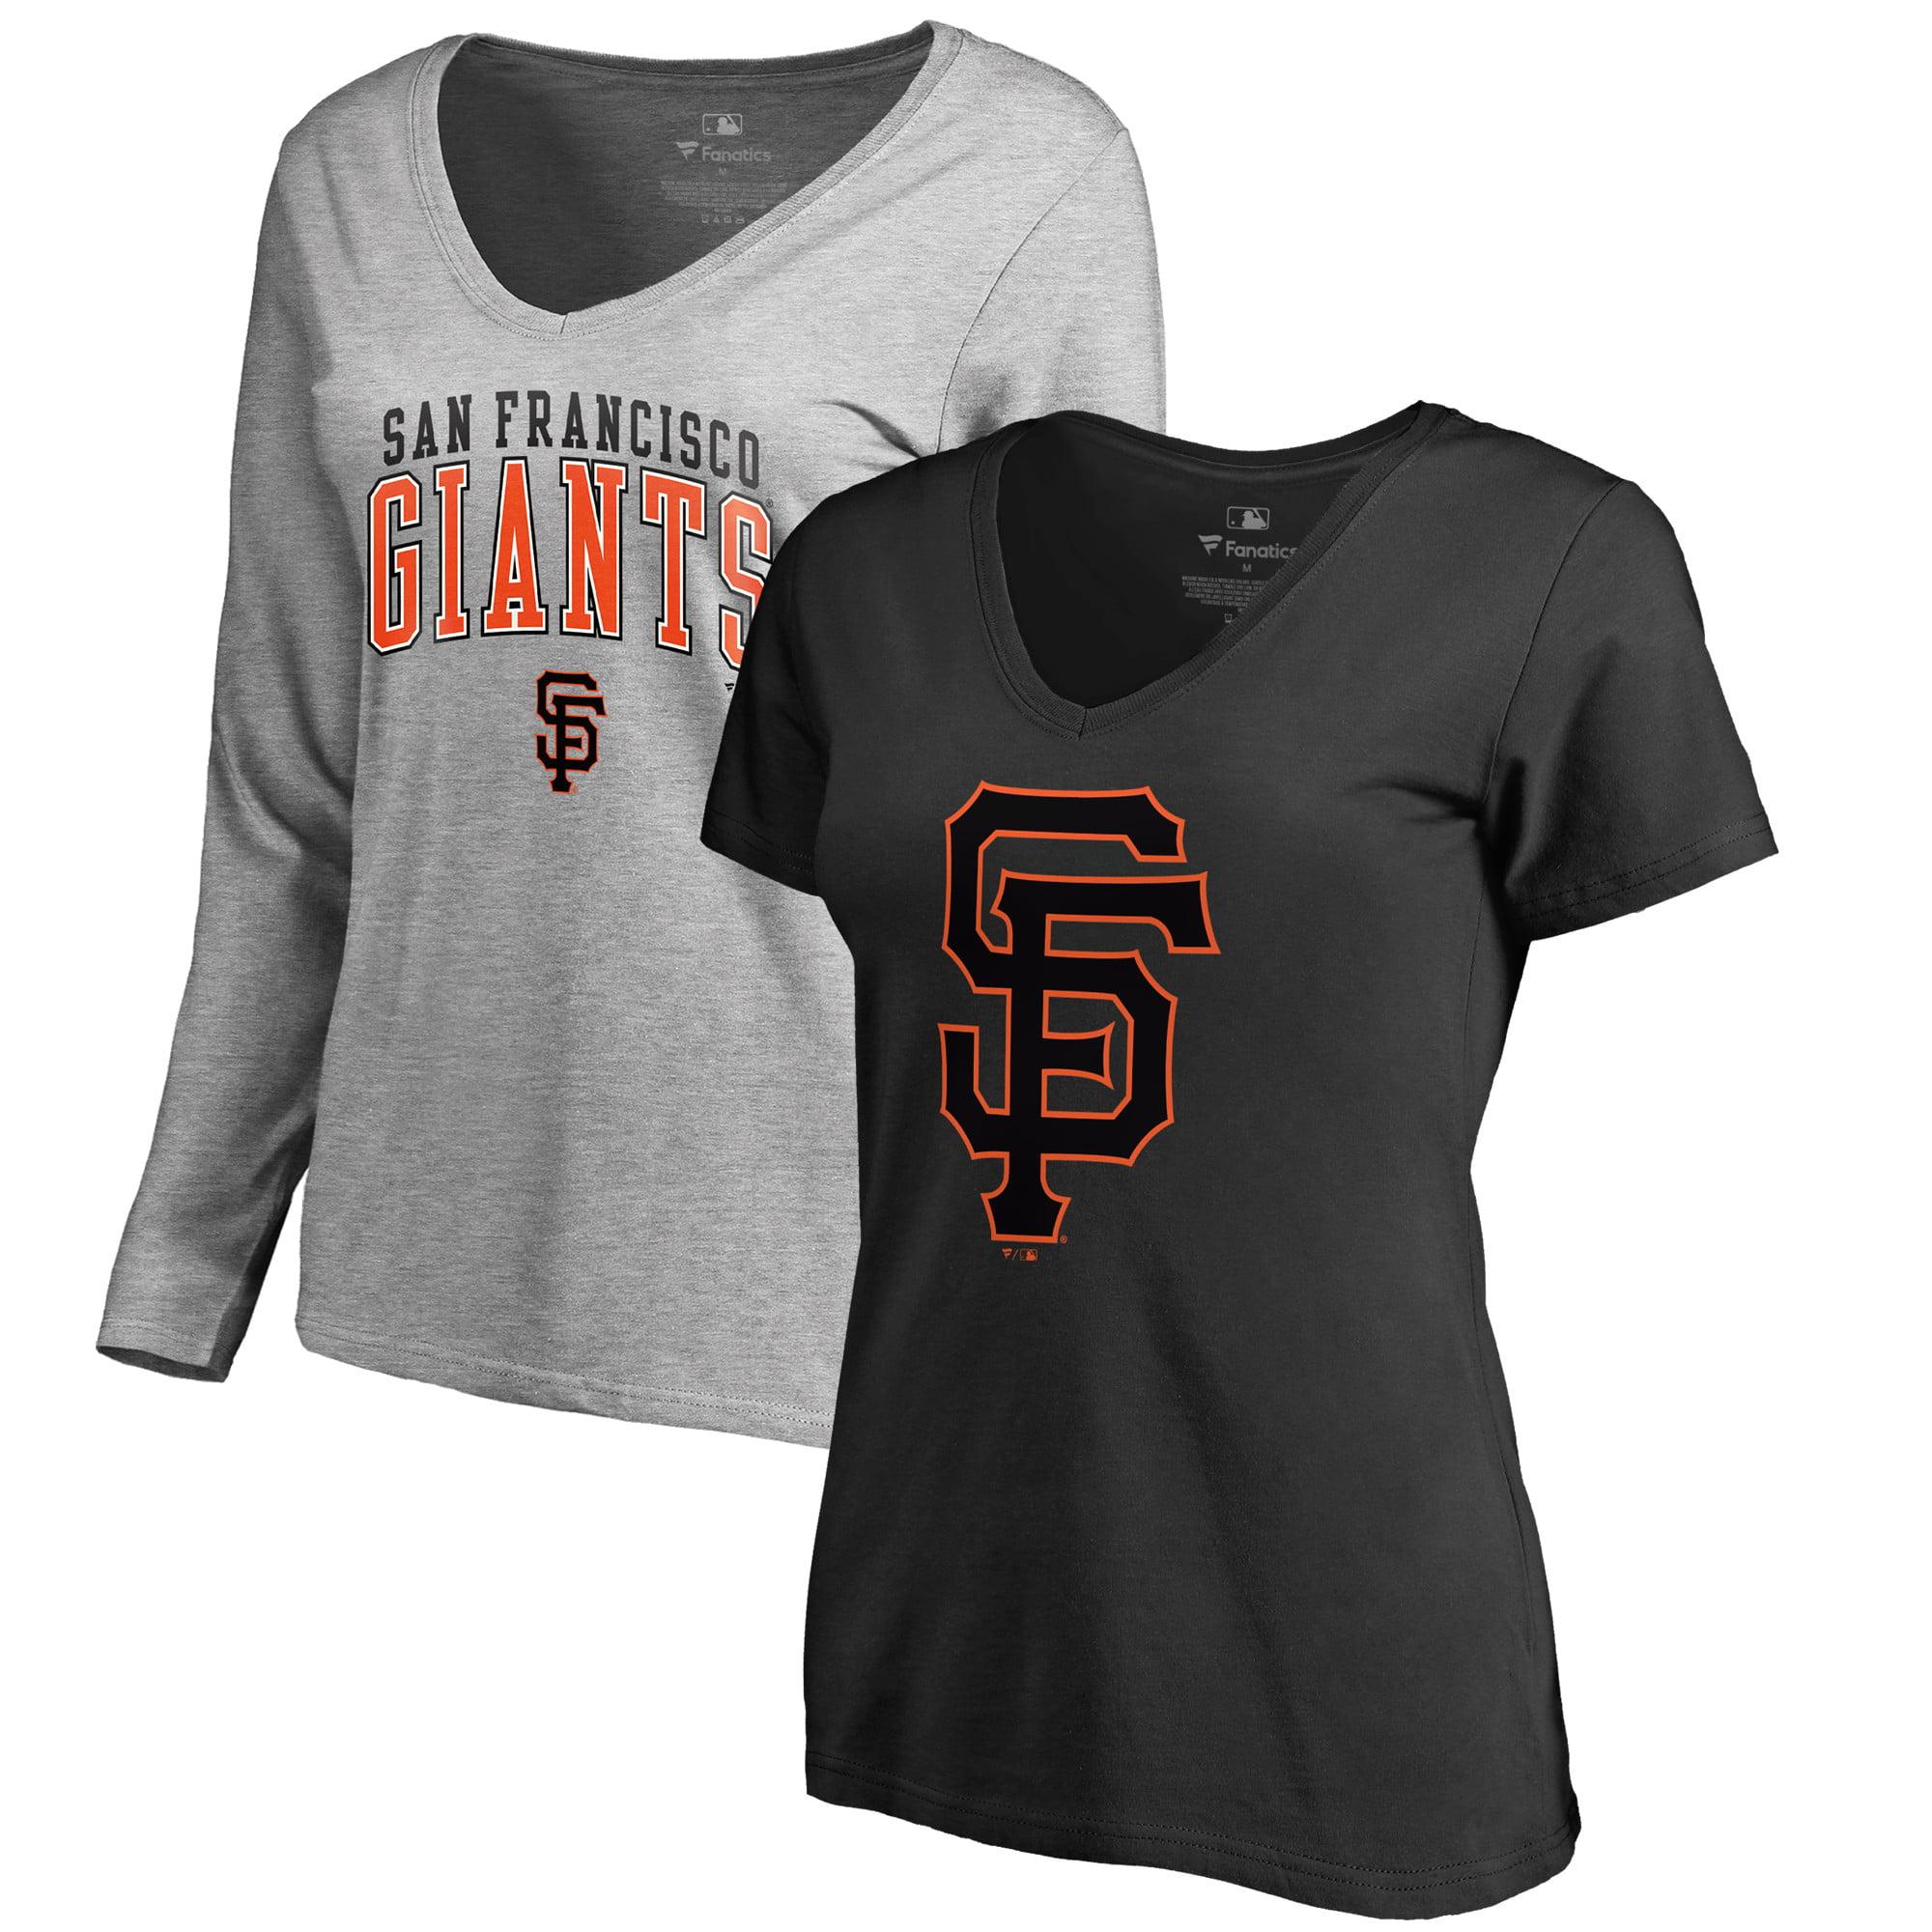 San Francisco Giants Fanatics Branded Big & Tall Combo T-Shirt Set - Black/Heathered Gray